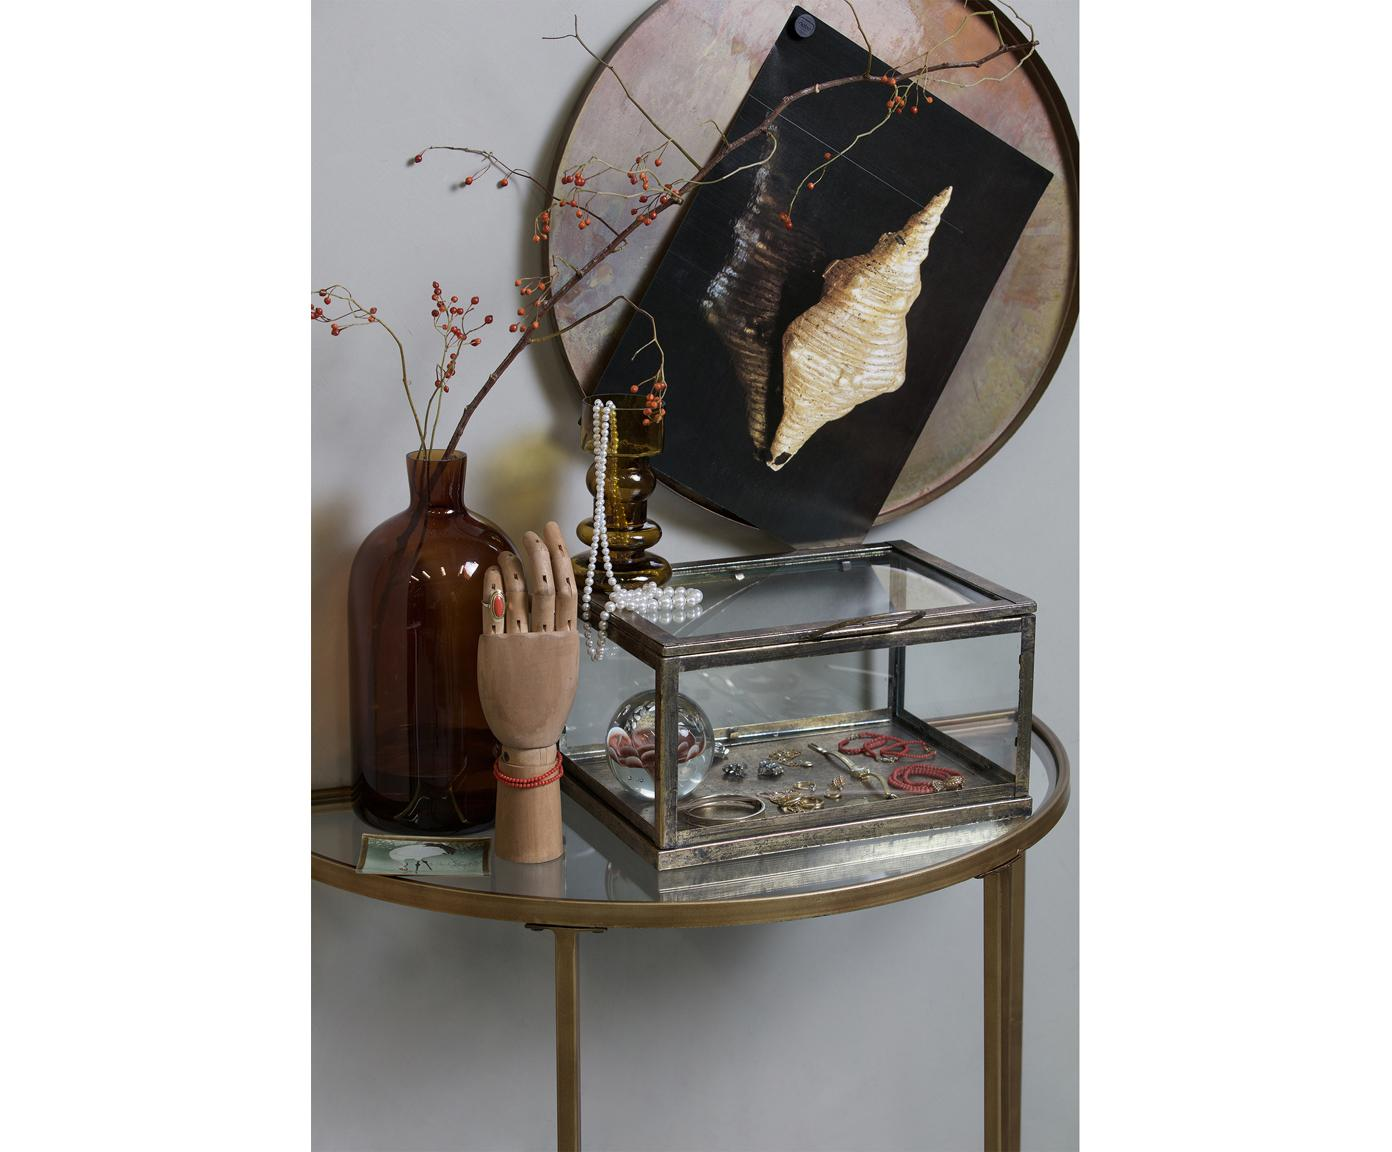 Halbrunde Glas-Konsole Goddess in Antik-Finish, Gestell: Metall, beschichtet, Messingfarben, 76 x 75 cm